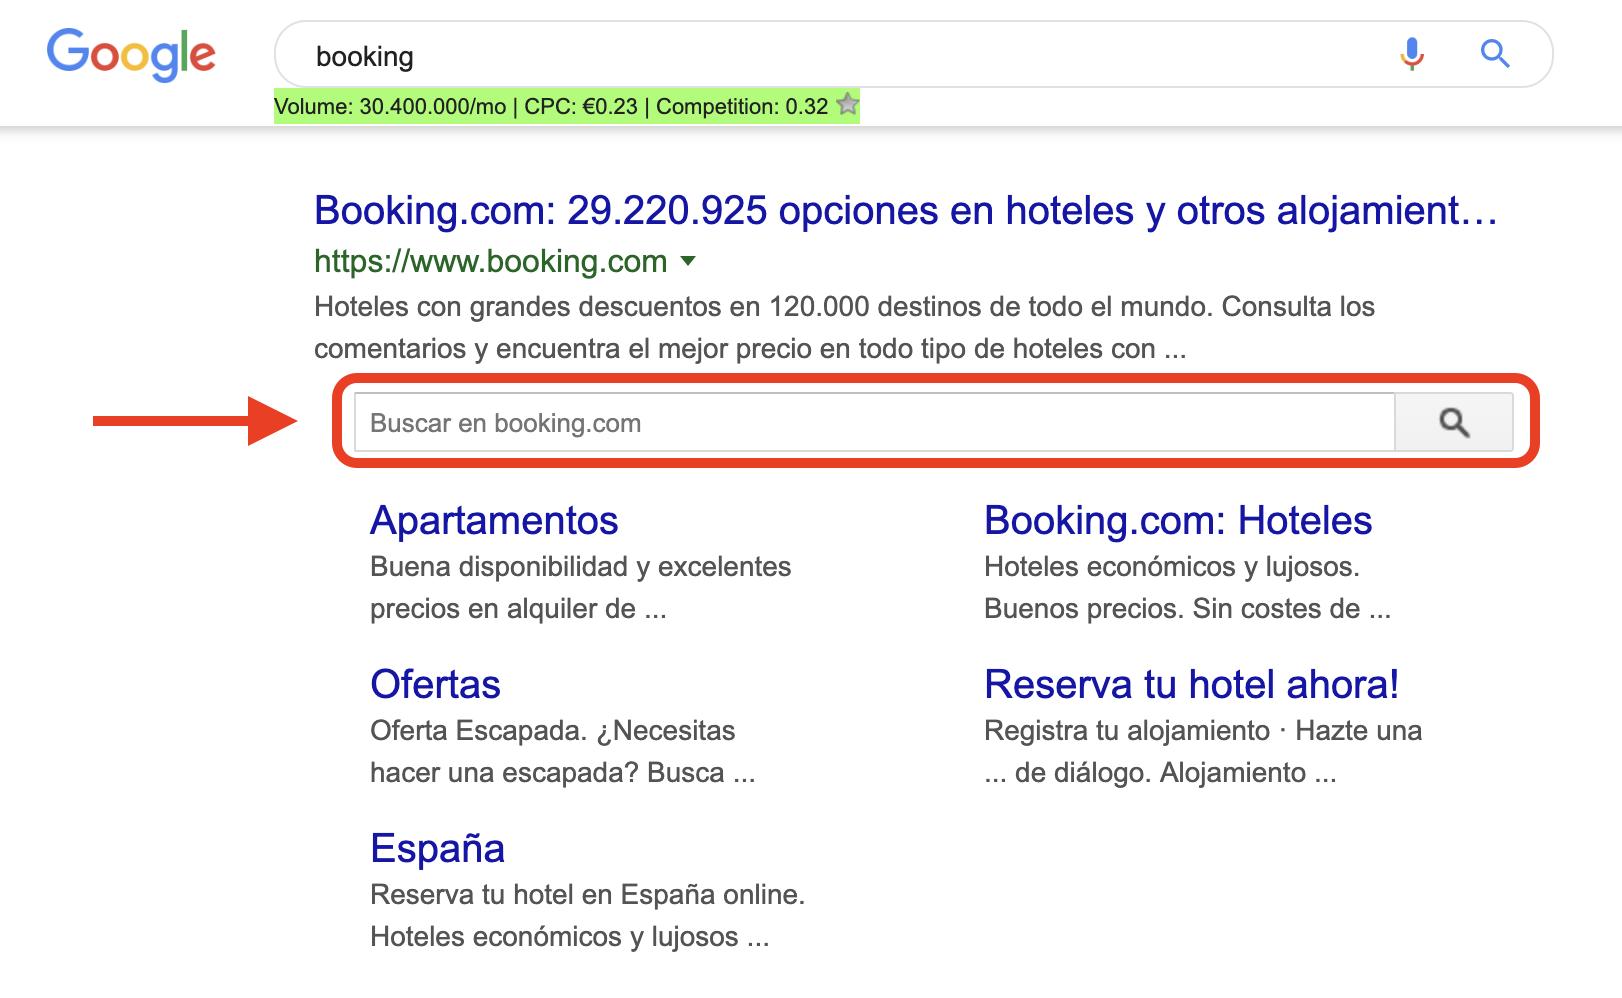 Datos estructurados - Booking